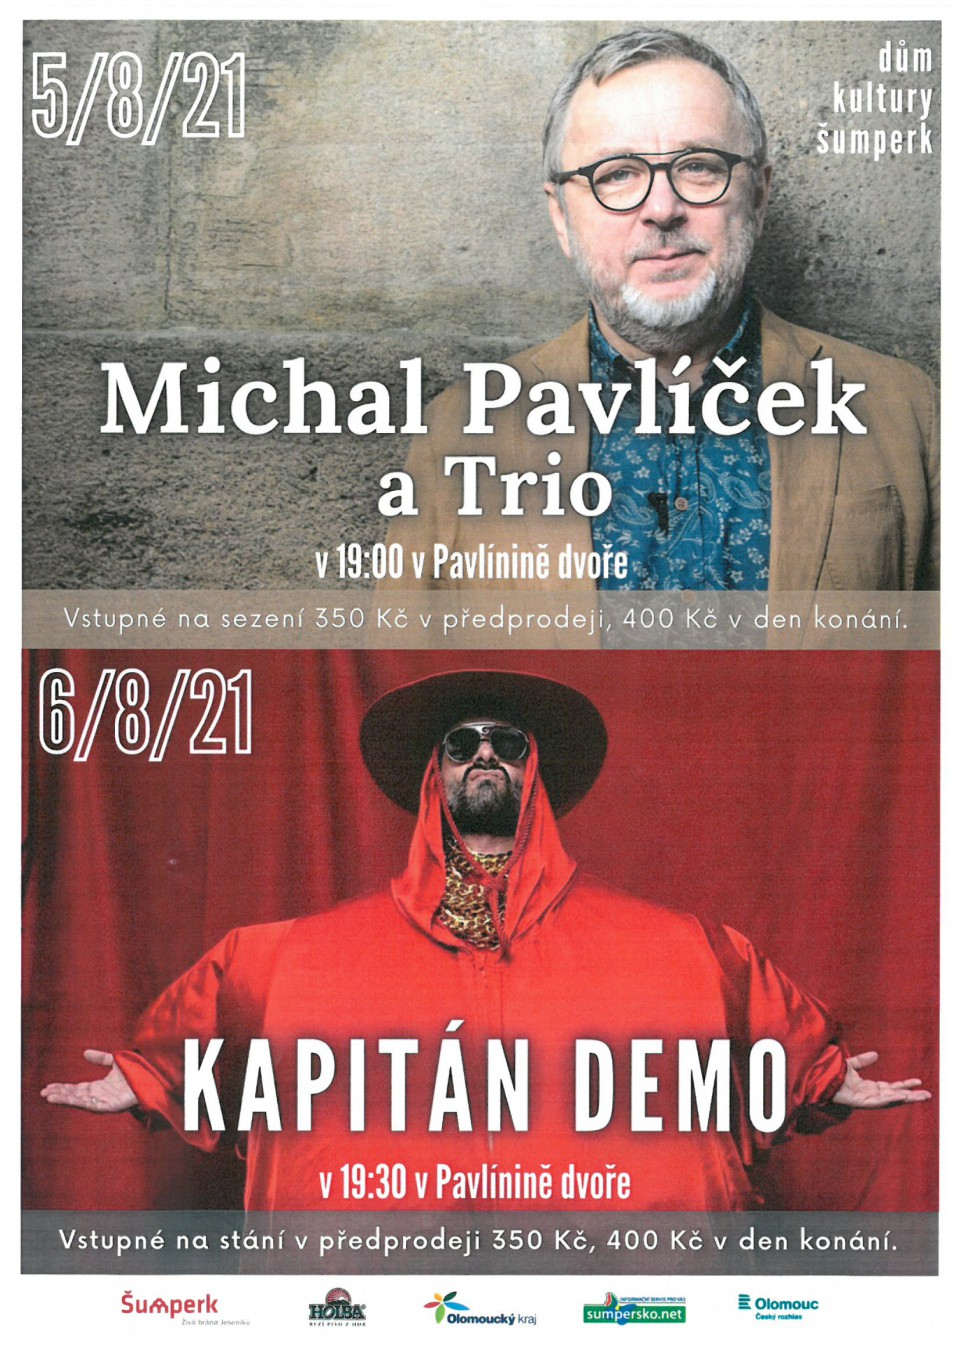 michal-pavlicek-a-trio-kapitan-demo